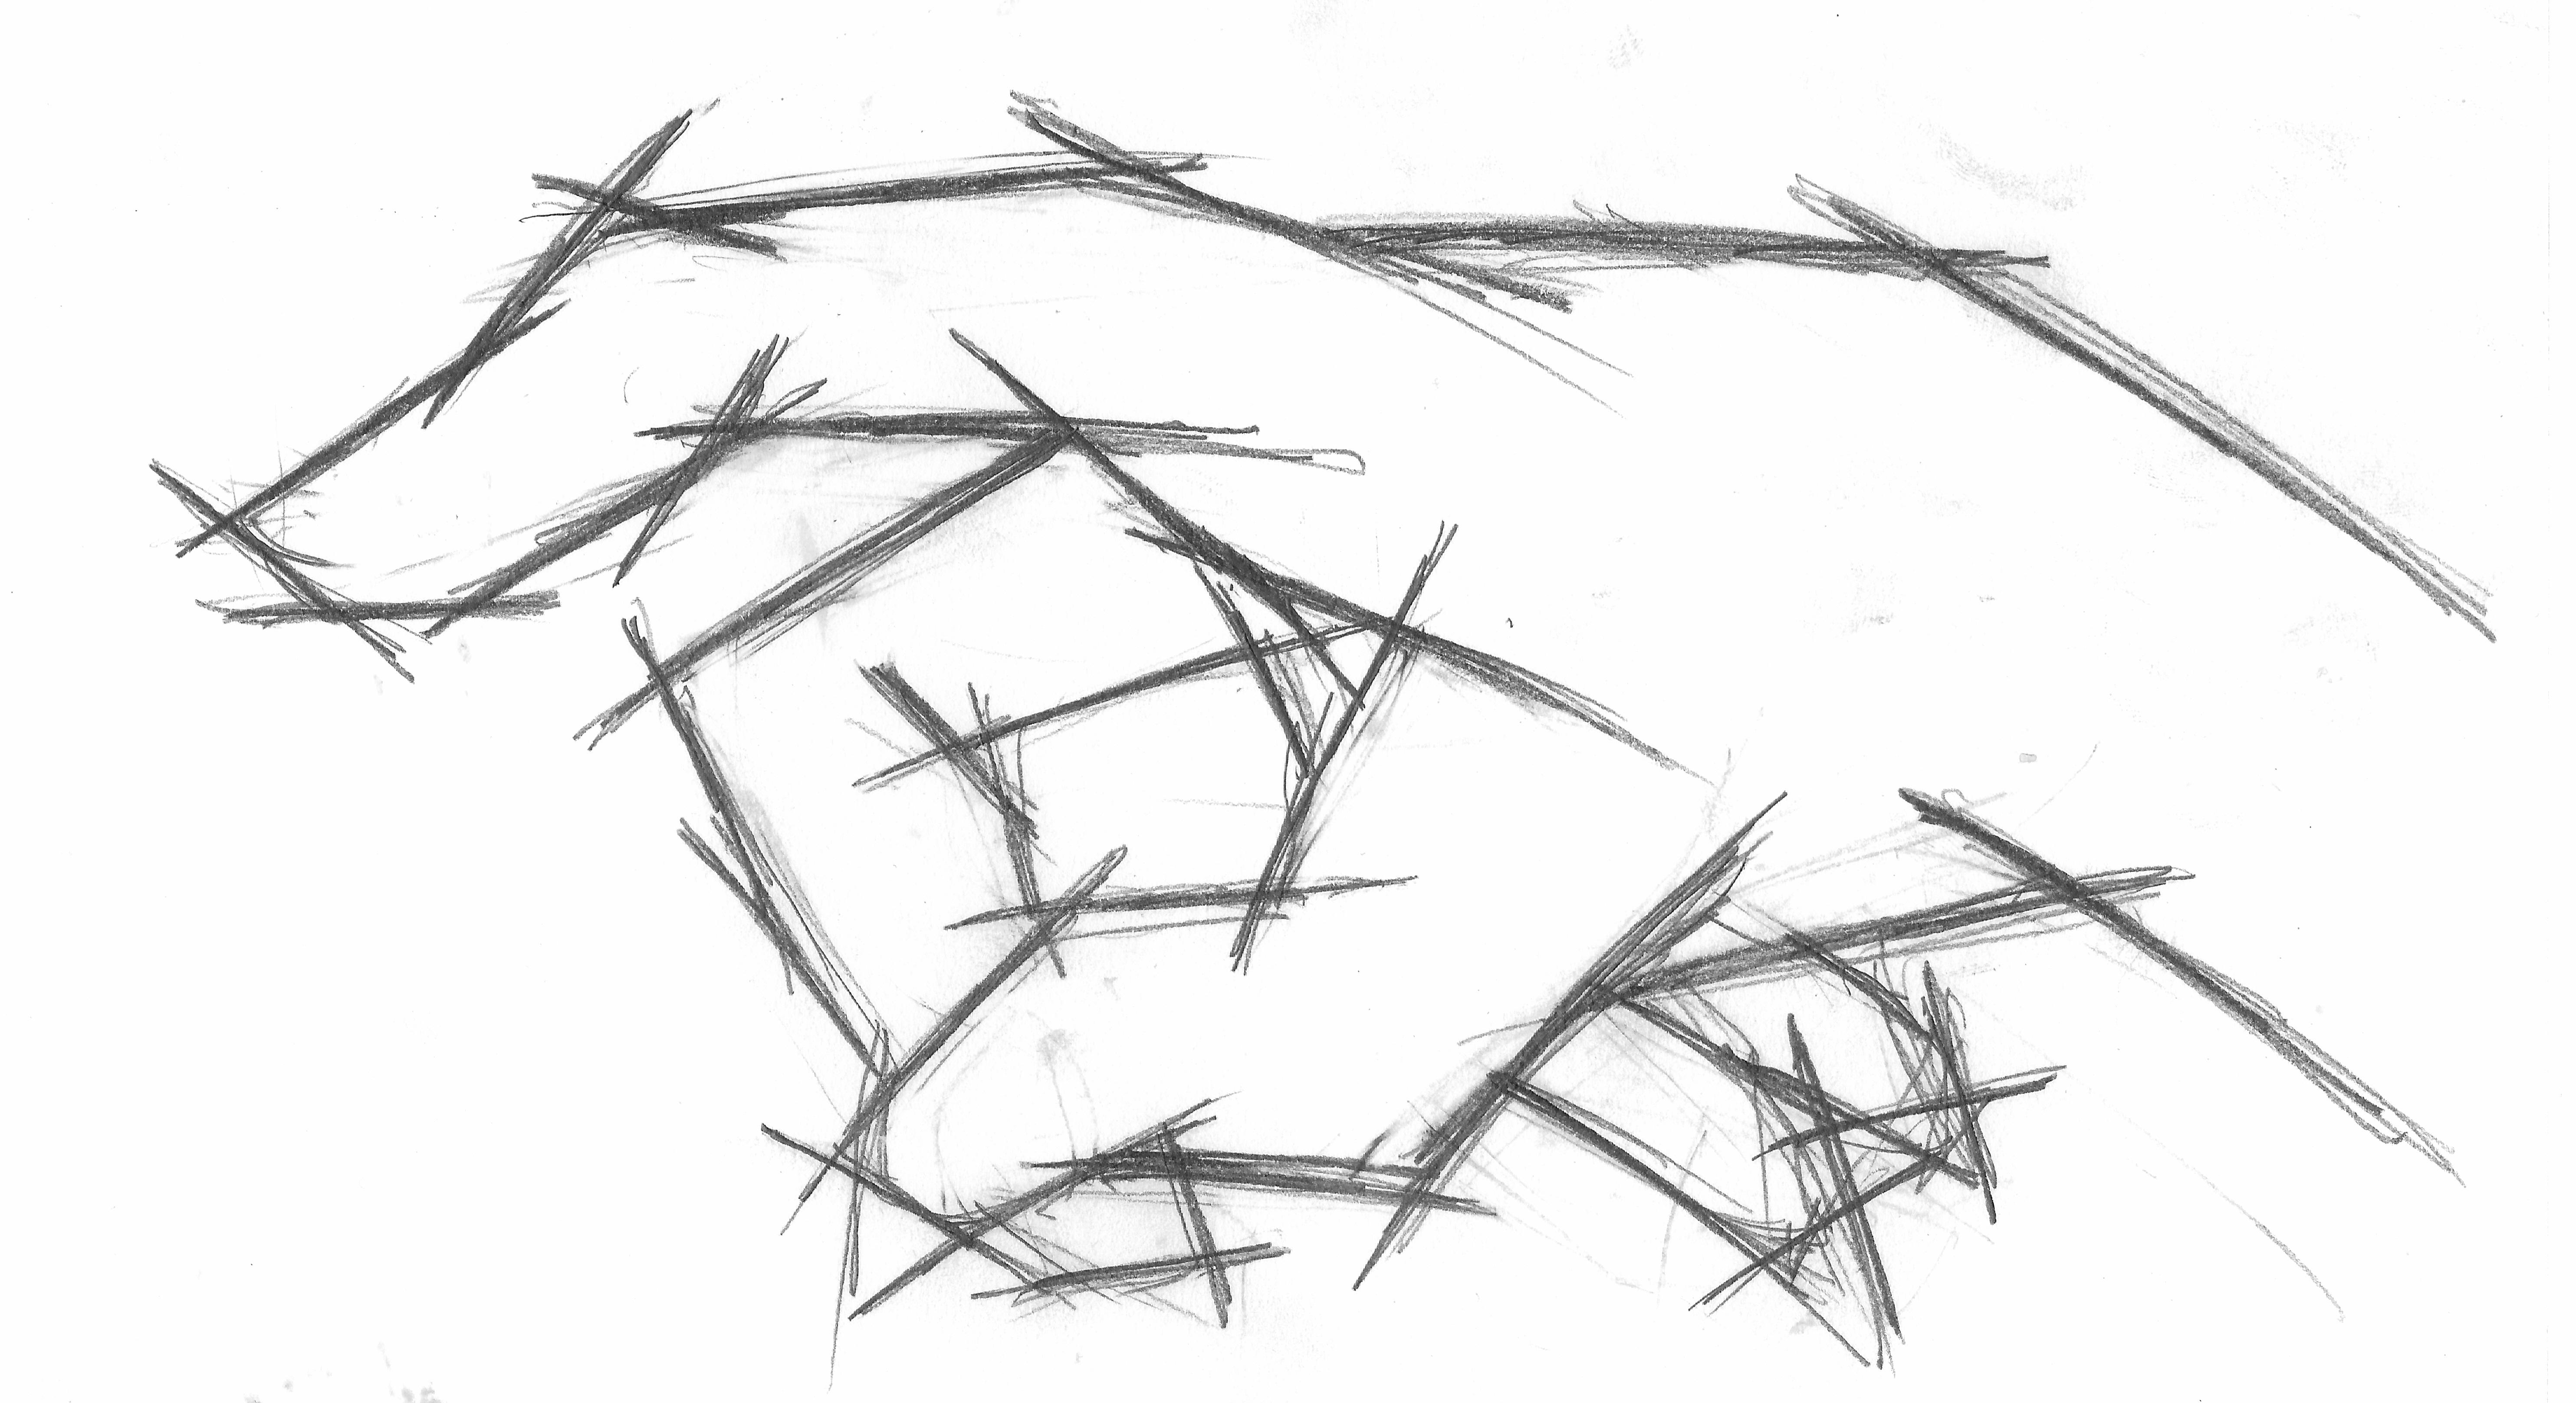 Line Drawing Sketches : Line frame hand sketch by lyanaling on deviantart